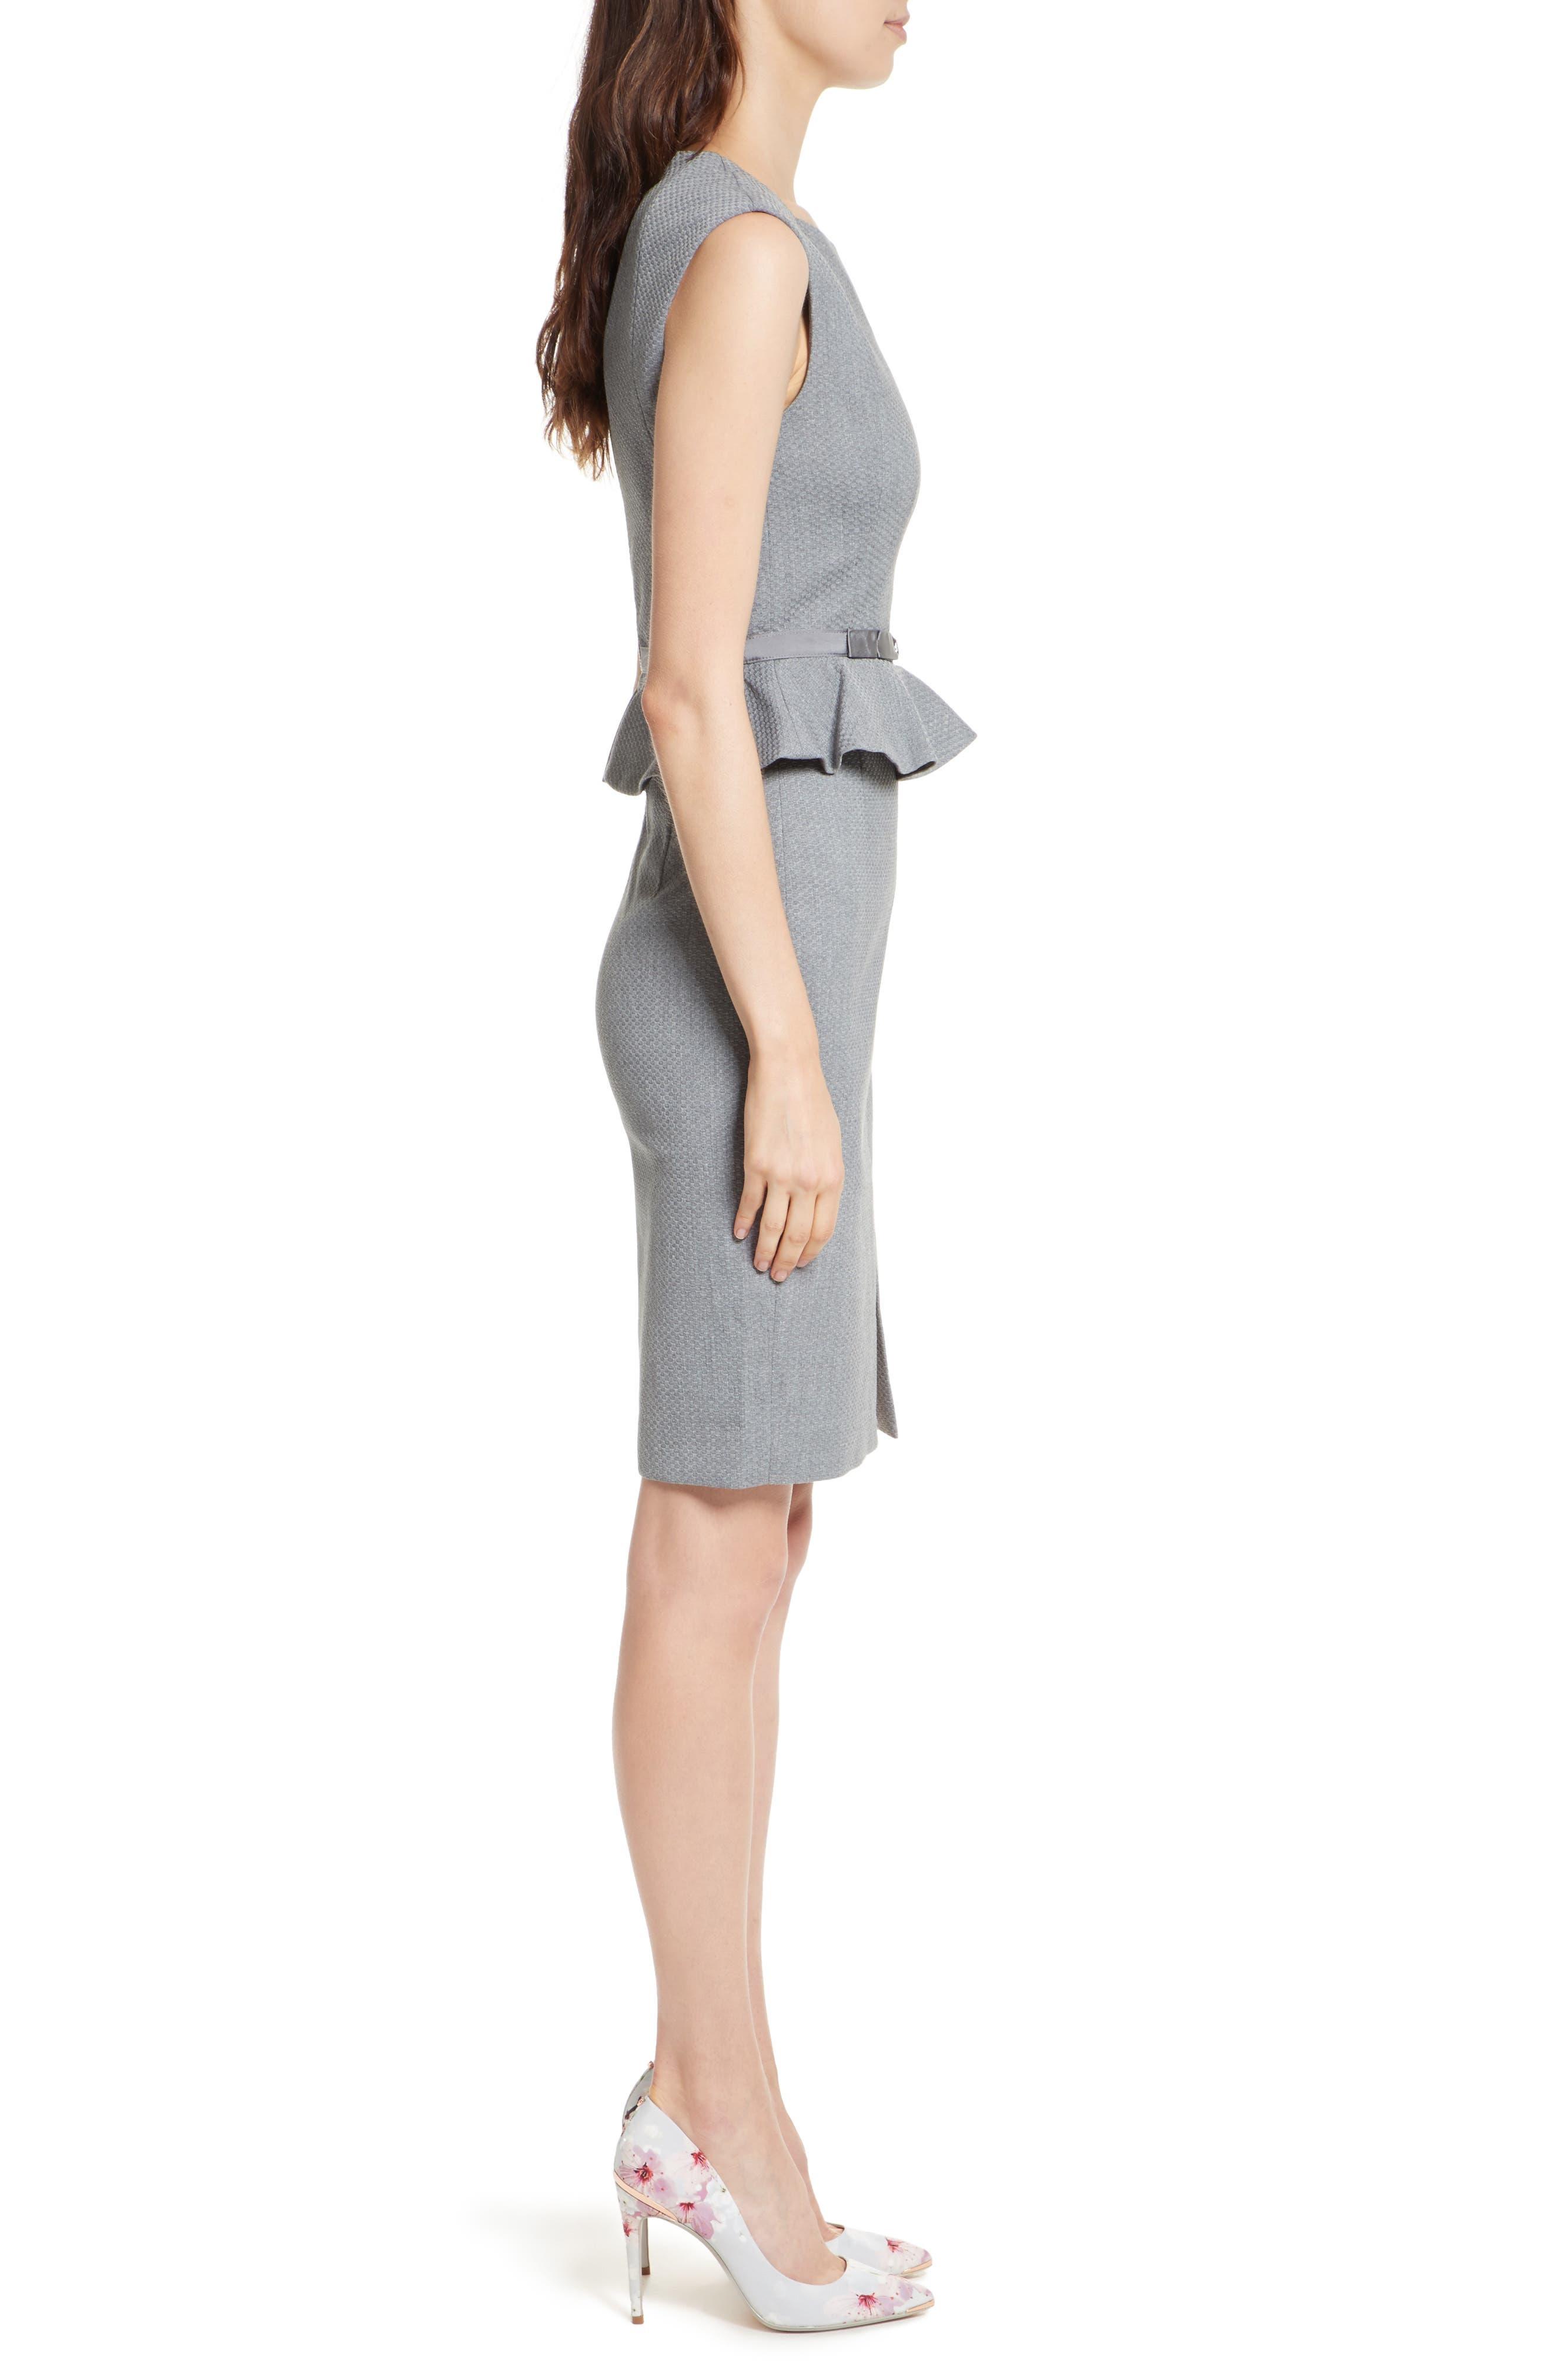 Nadaed Bow Detail Textured Peplum Dress,                             Alternate thumbnail 3, color,                             021